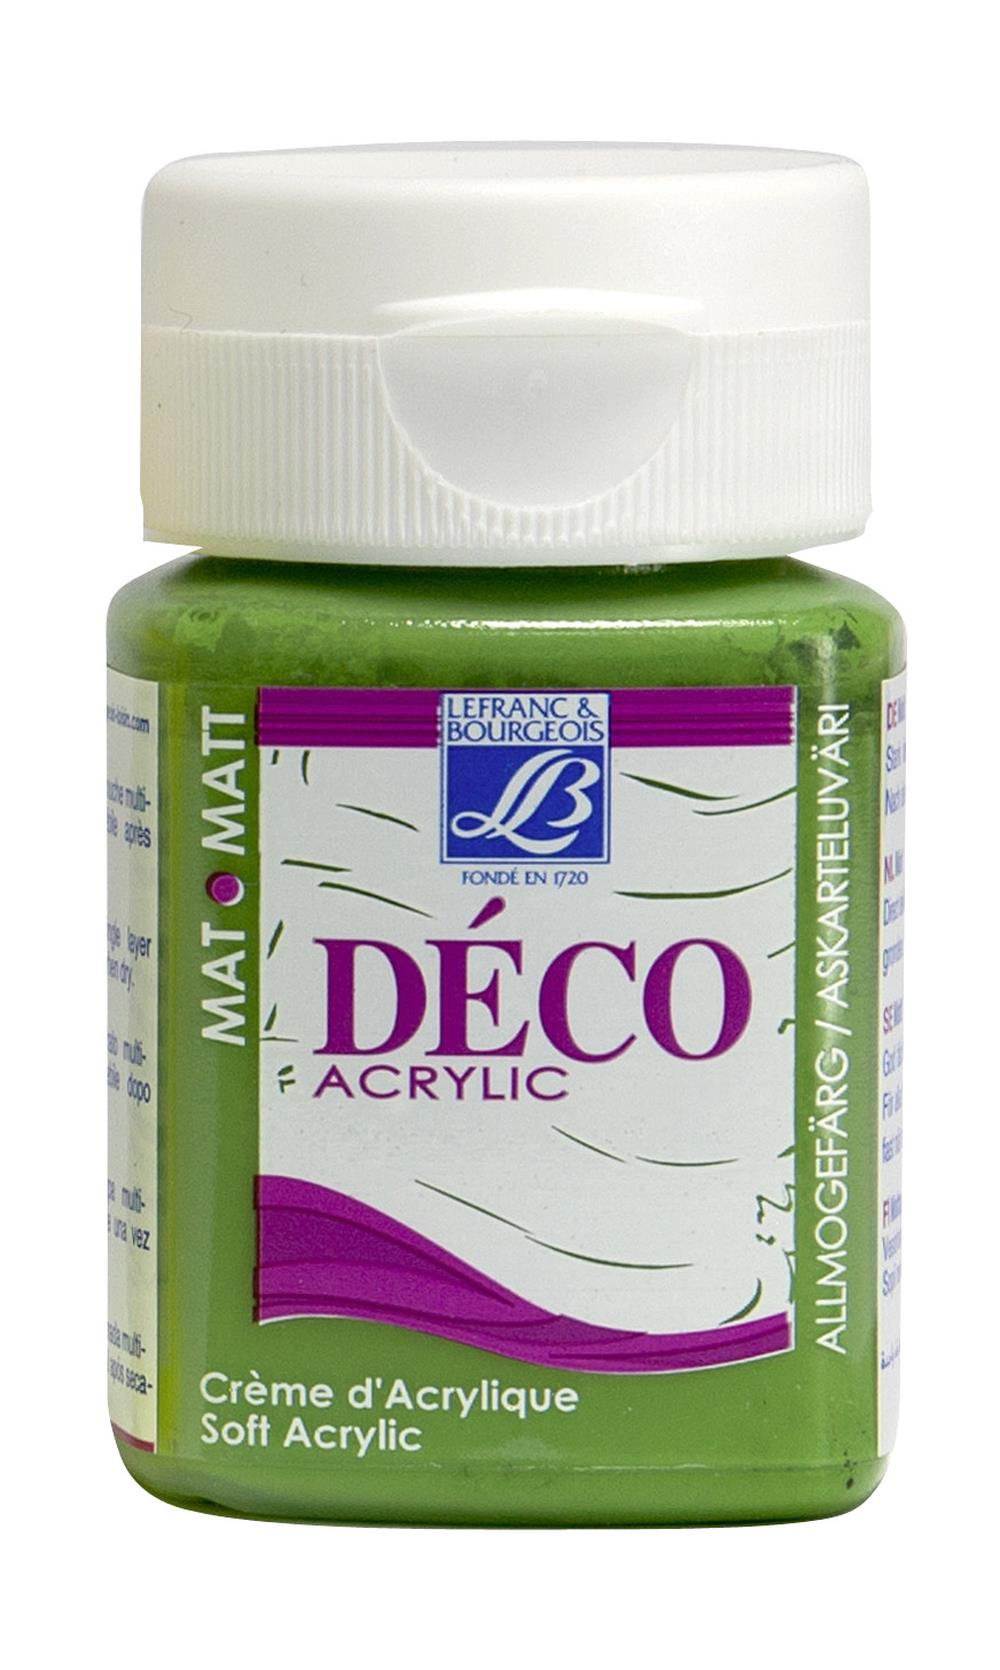 Hobbyfärg L&B Deco Matt Akryl 50ml Chlorophyll green warm 571 (4F) Utgår